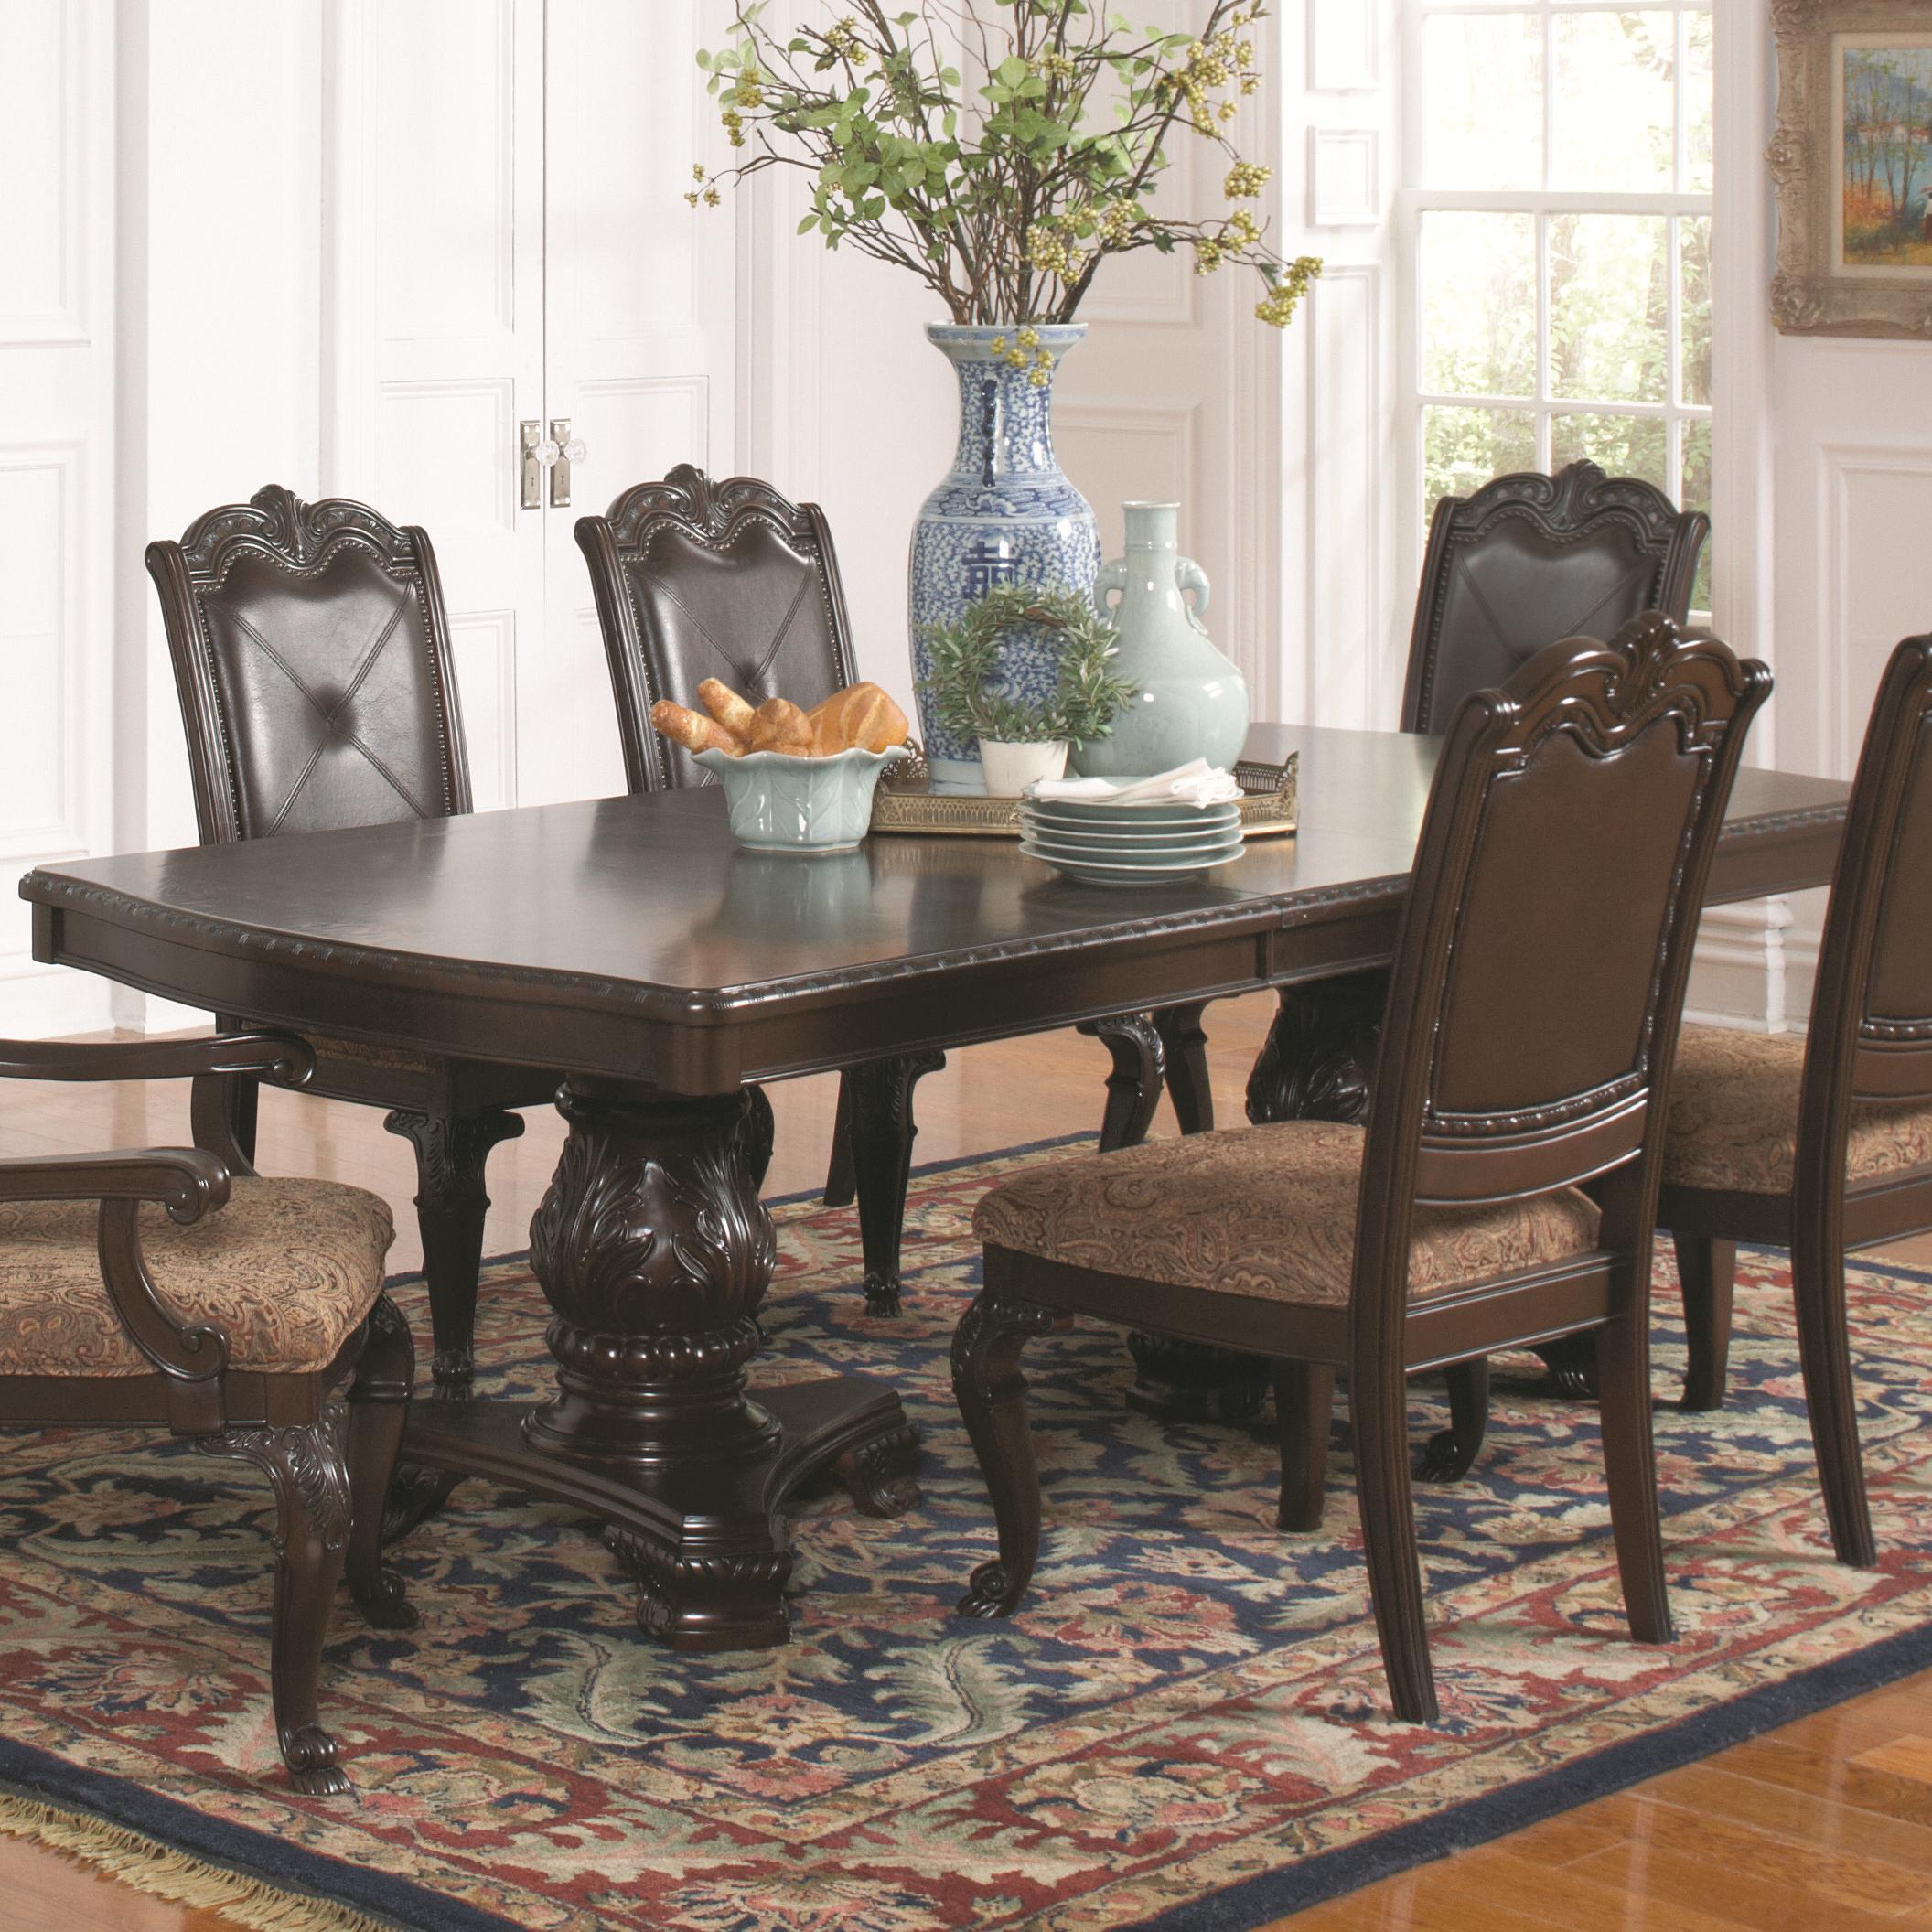 Coaster Valentina Rectangular Dining Table - Item Number: 105381